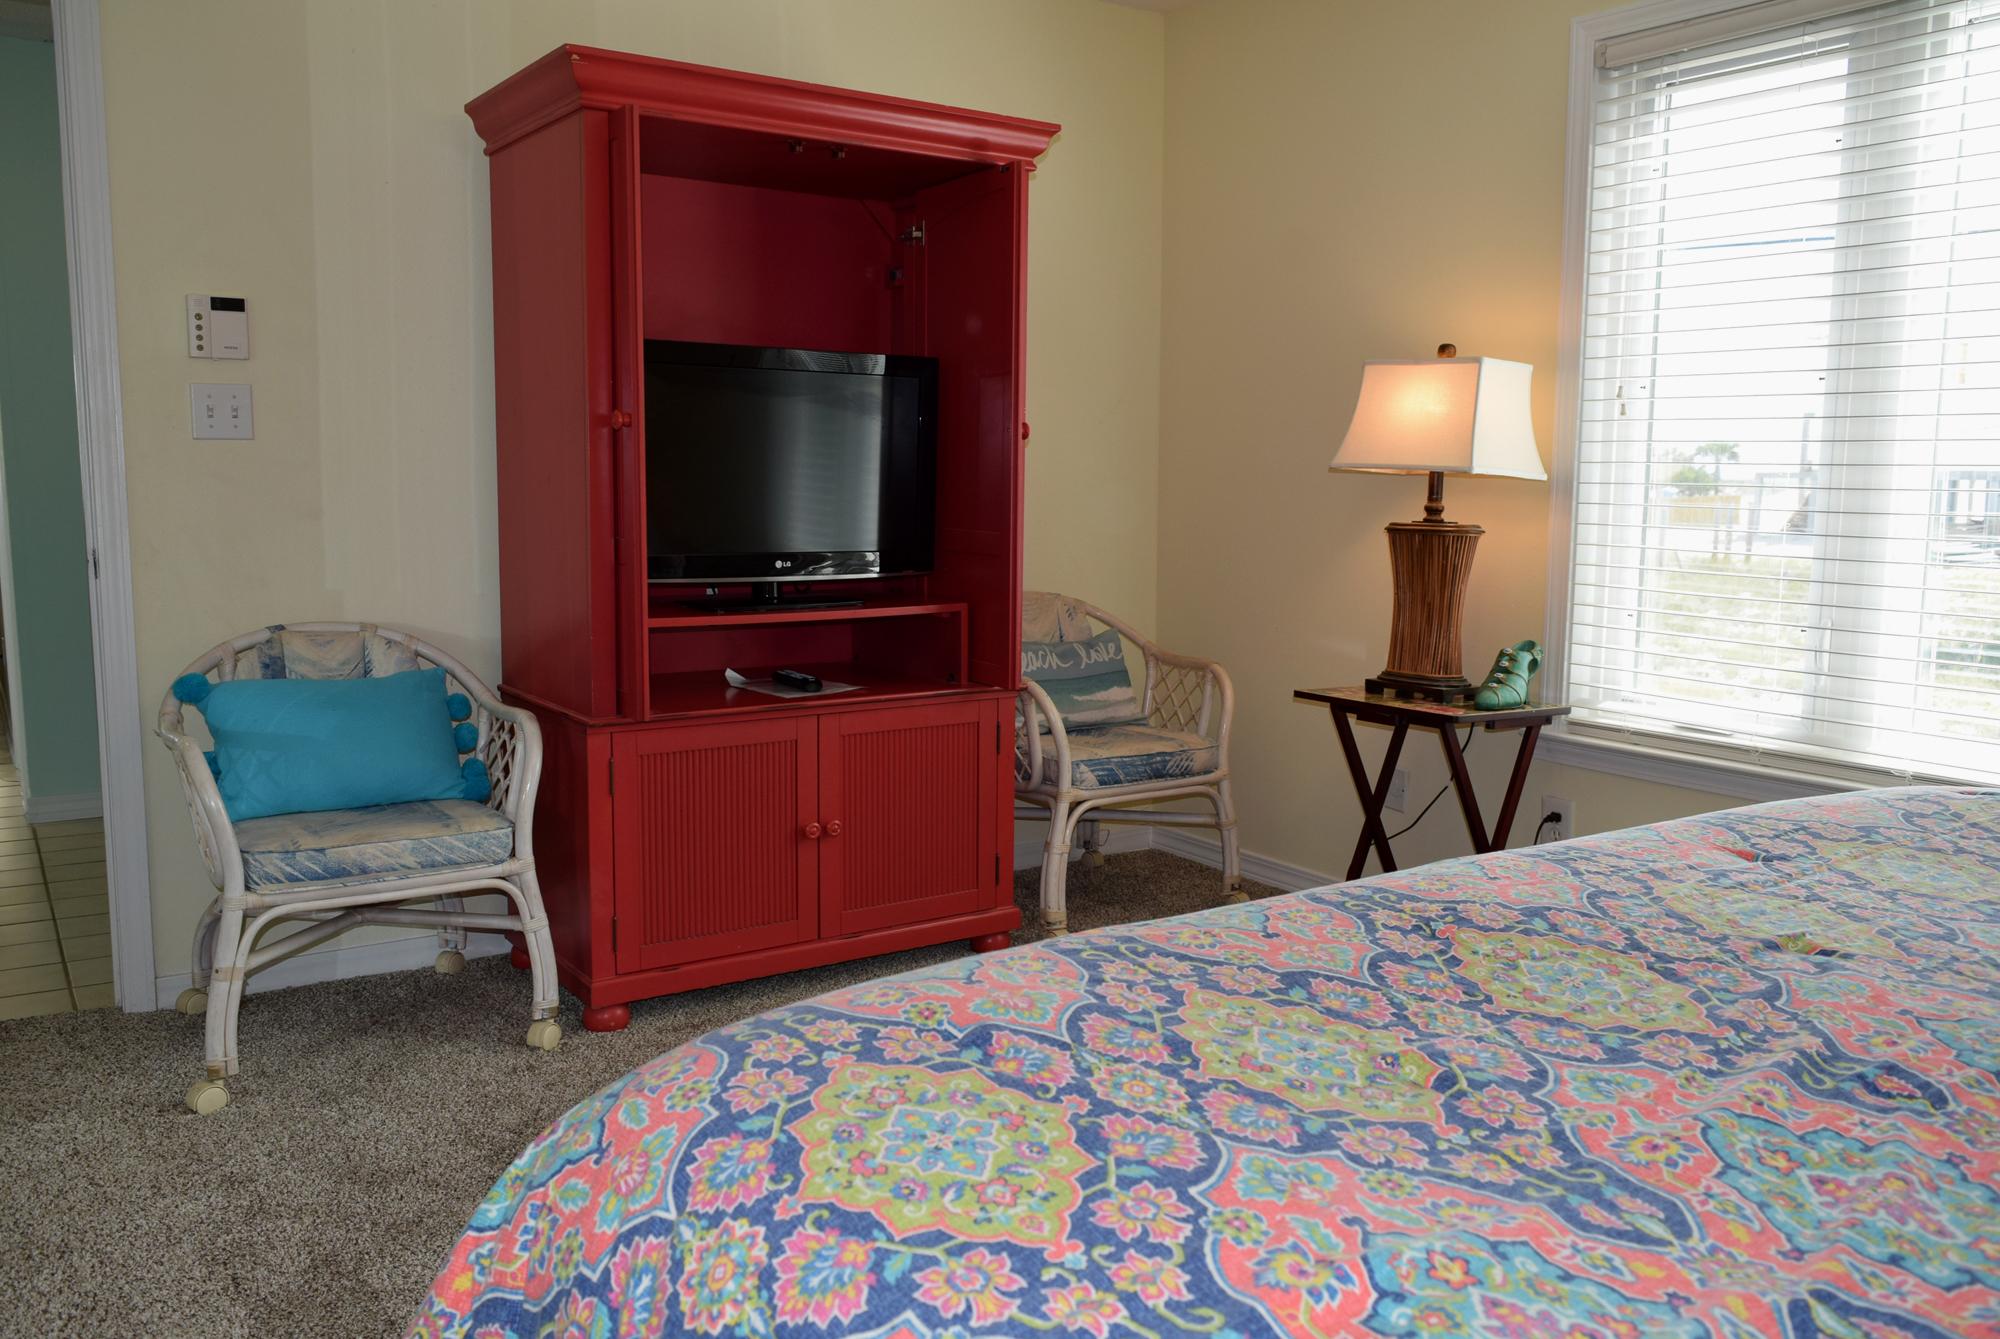 Maldonado 1103 House/Cottage rental in Pensacola Beach House Rentals in Pensacola Beach Florida - #12